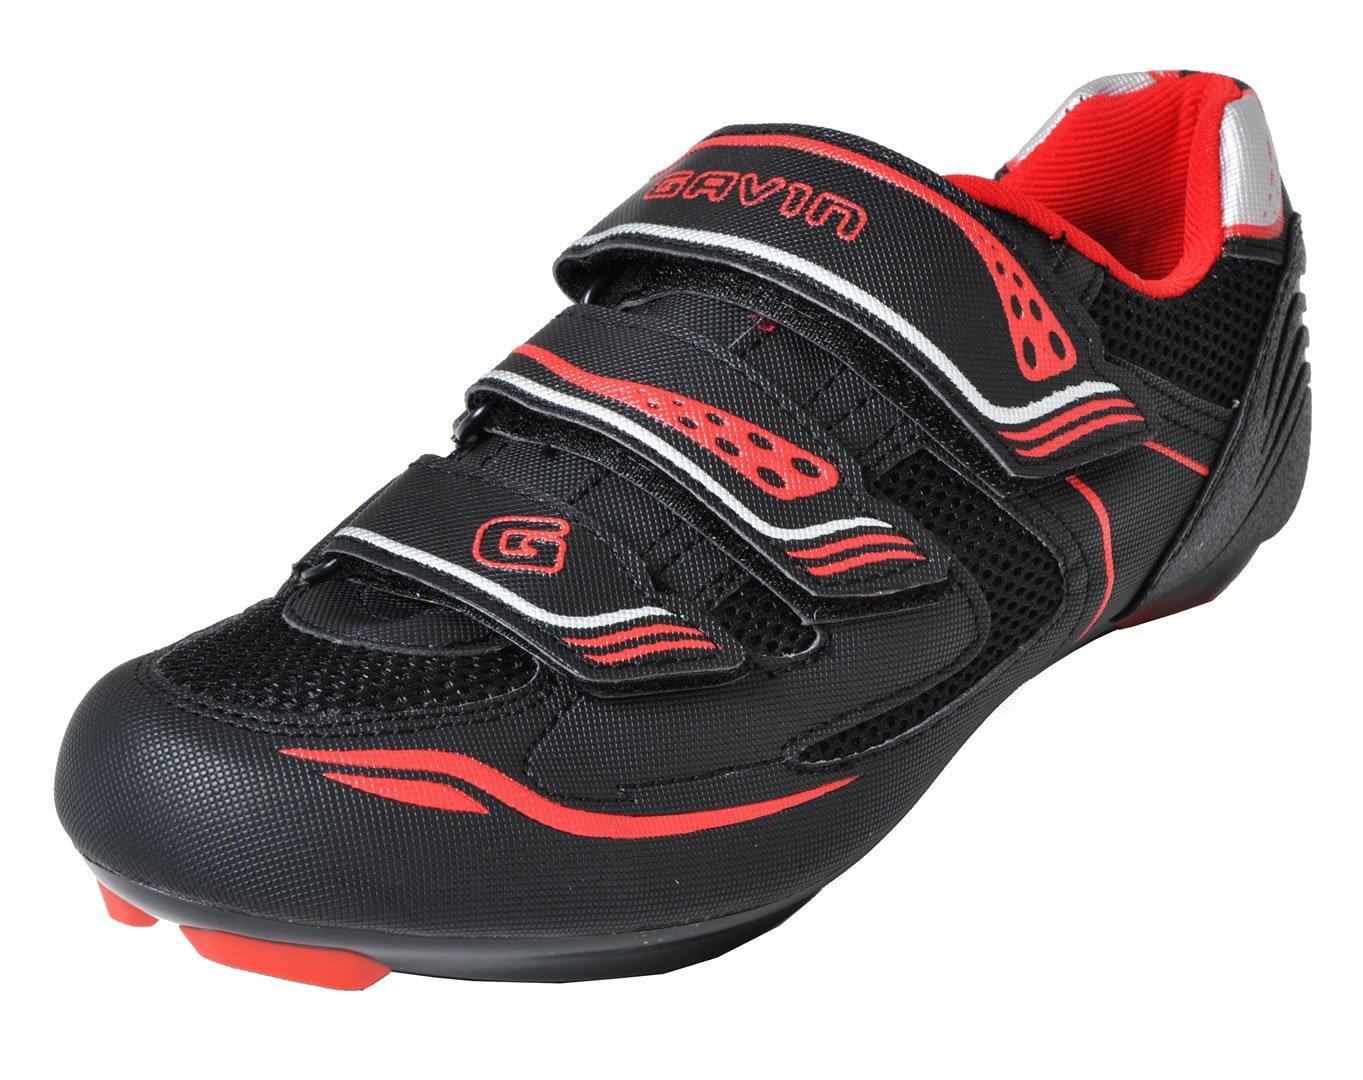 Gavin Men's VELO Road Bike Cycling Shoe, Black/Red, 43 EU by Gavin